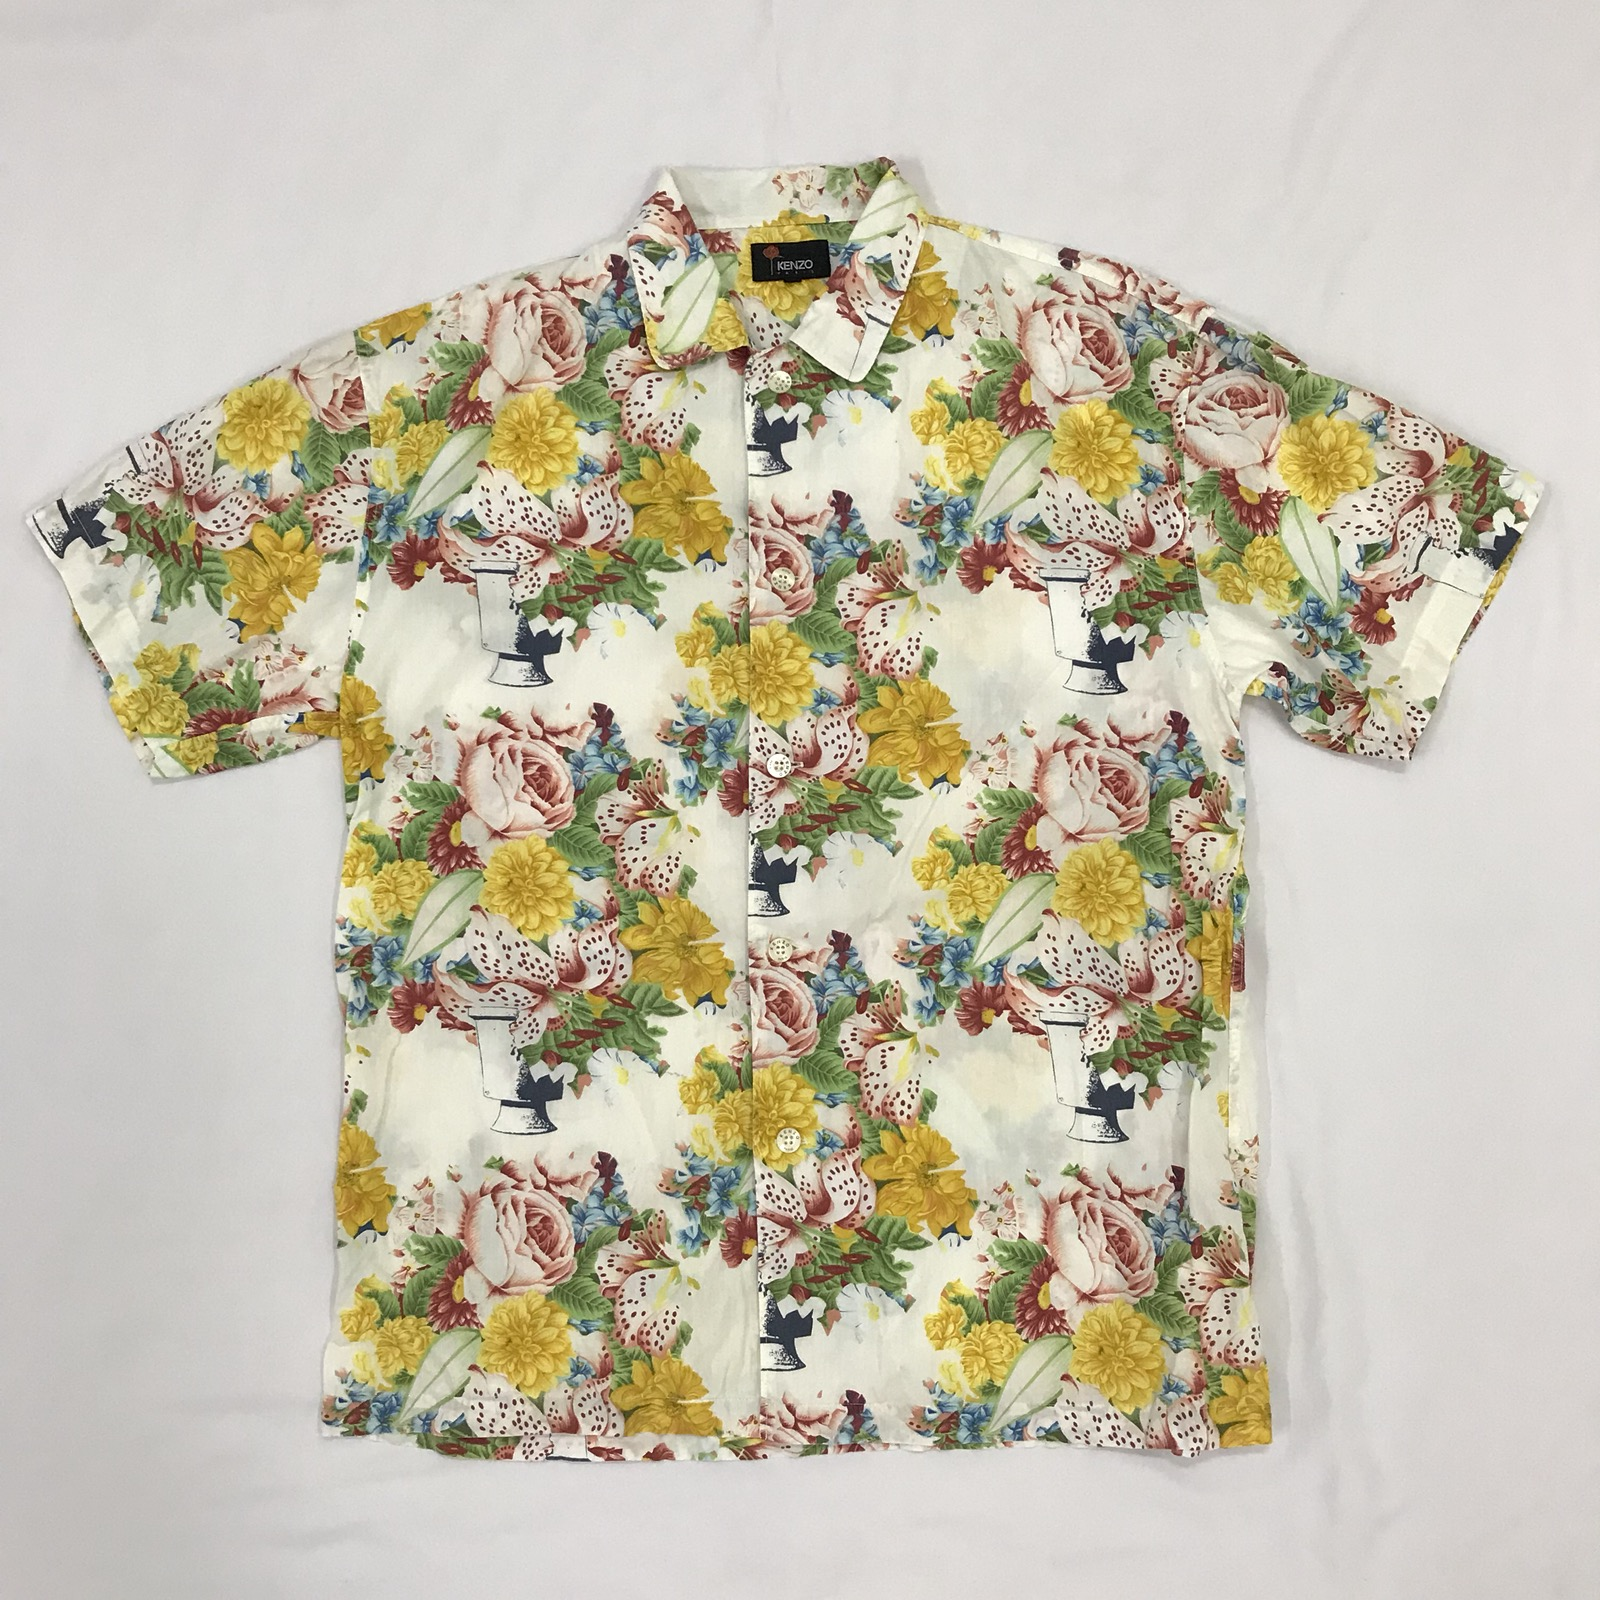 12e6686b049c7 Kenzo Vintage Kenzo Paris Hawaii Floral Full Print Shirt